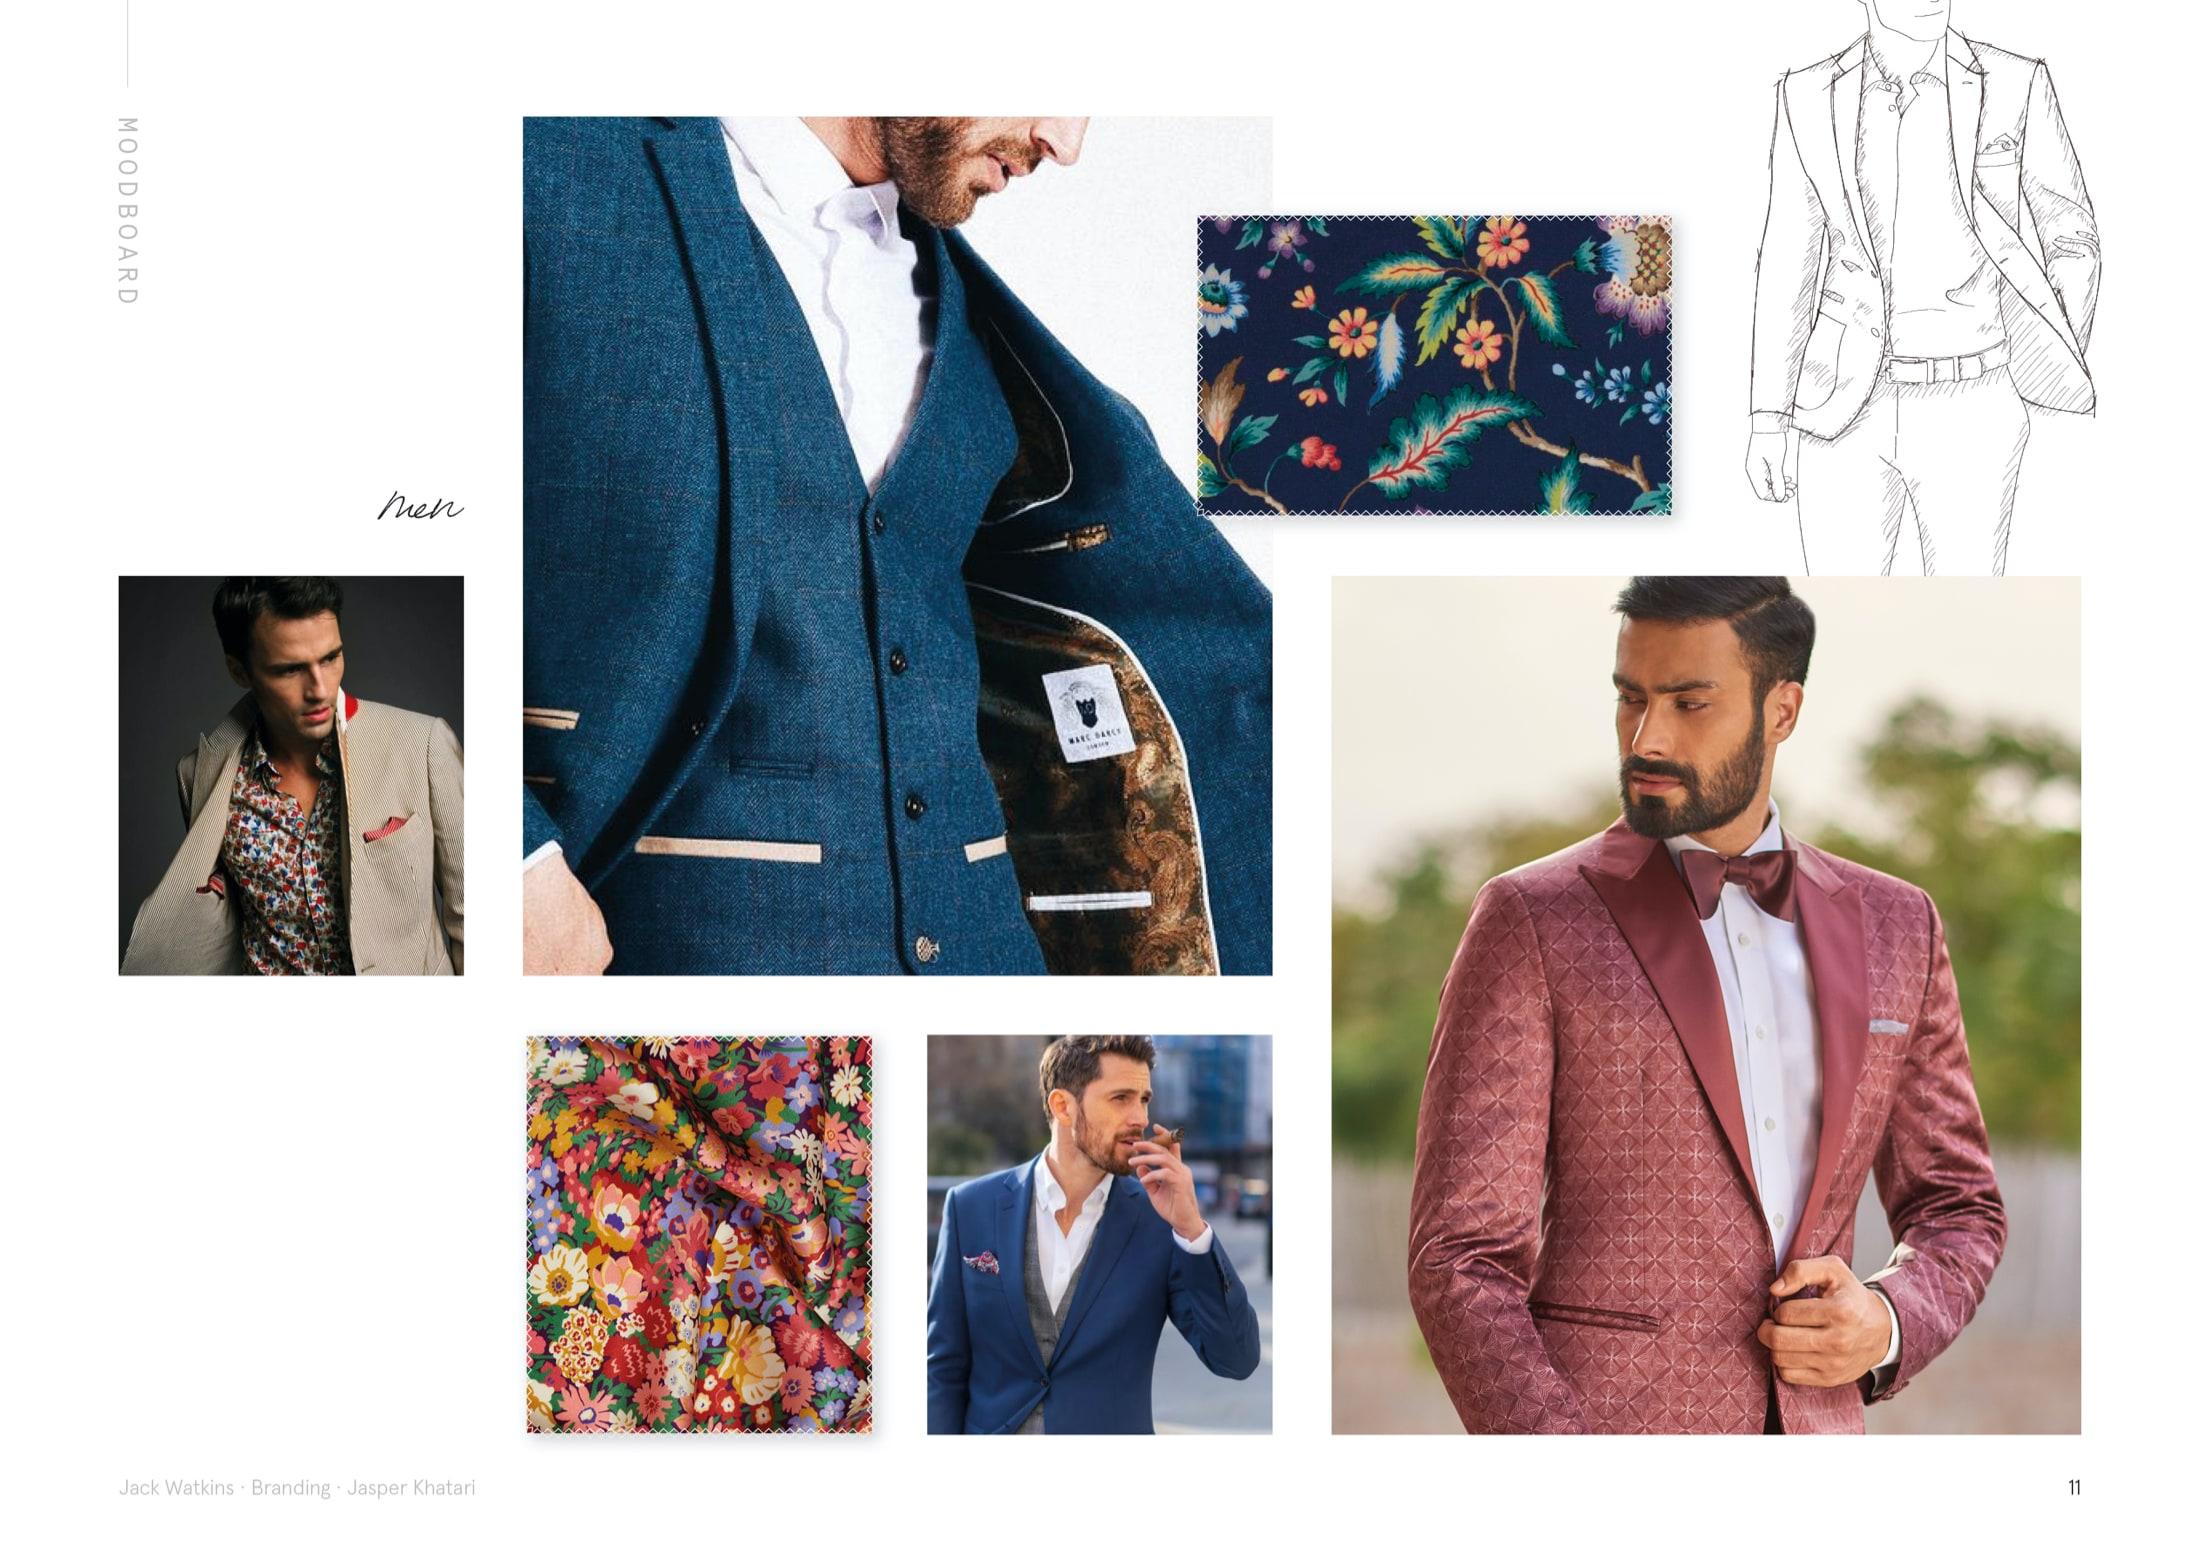 Menswear moodboard curation for Savile Row tailor, Jasper Khatari